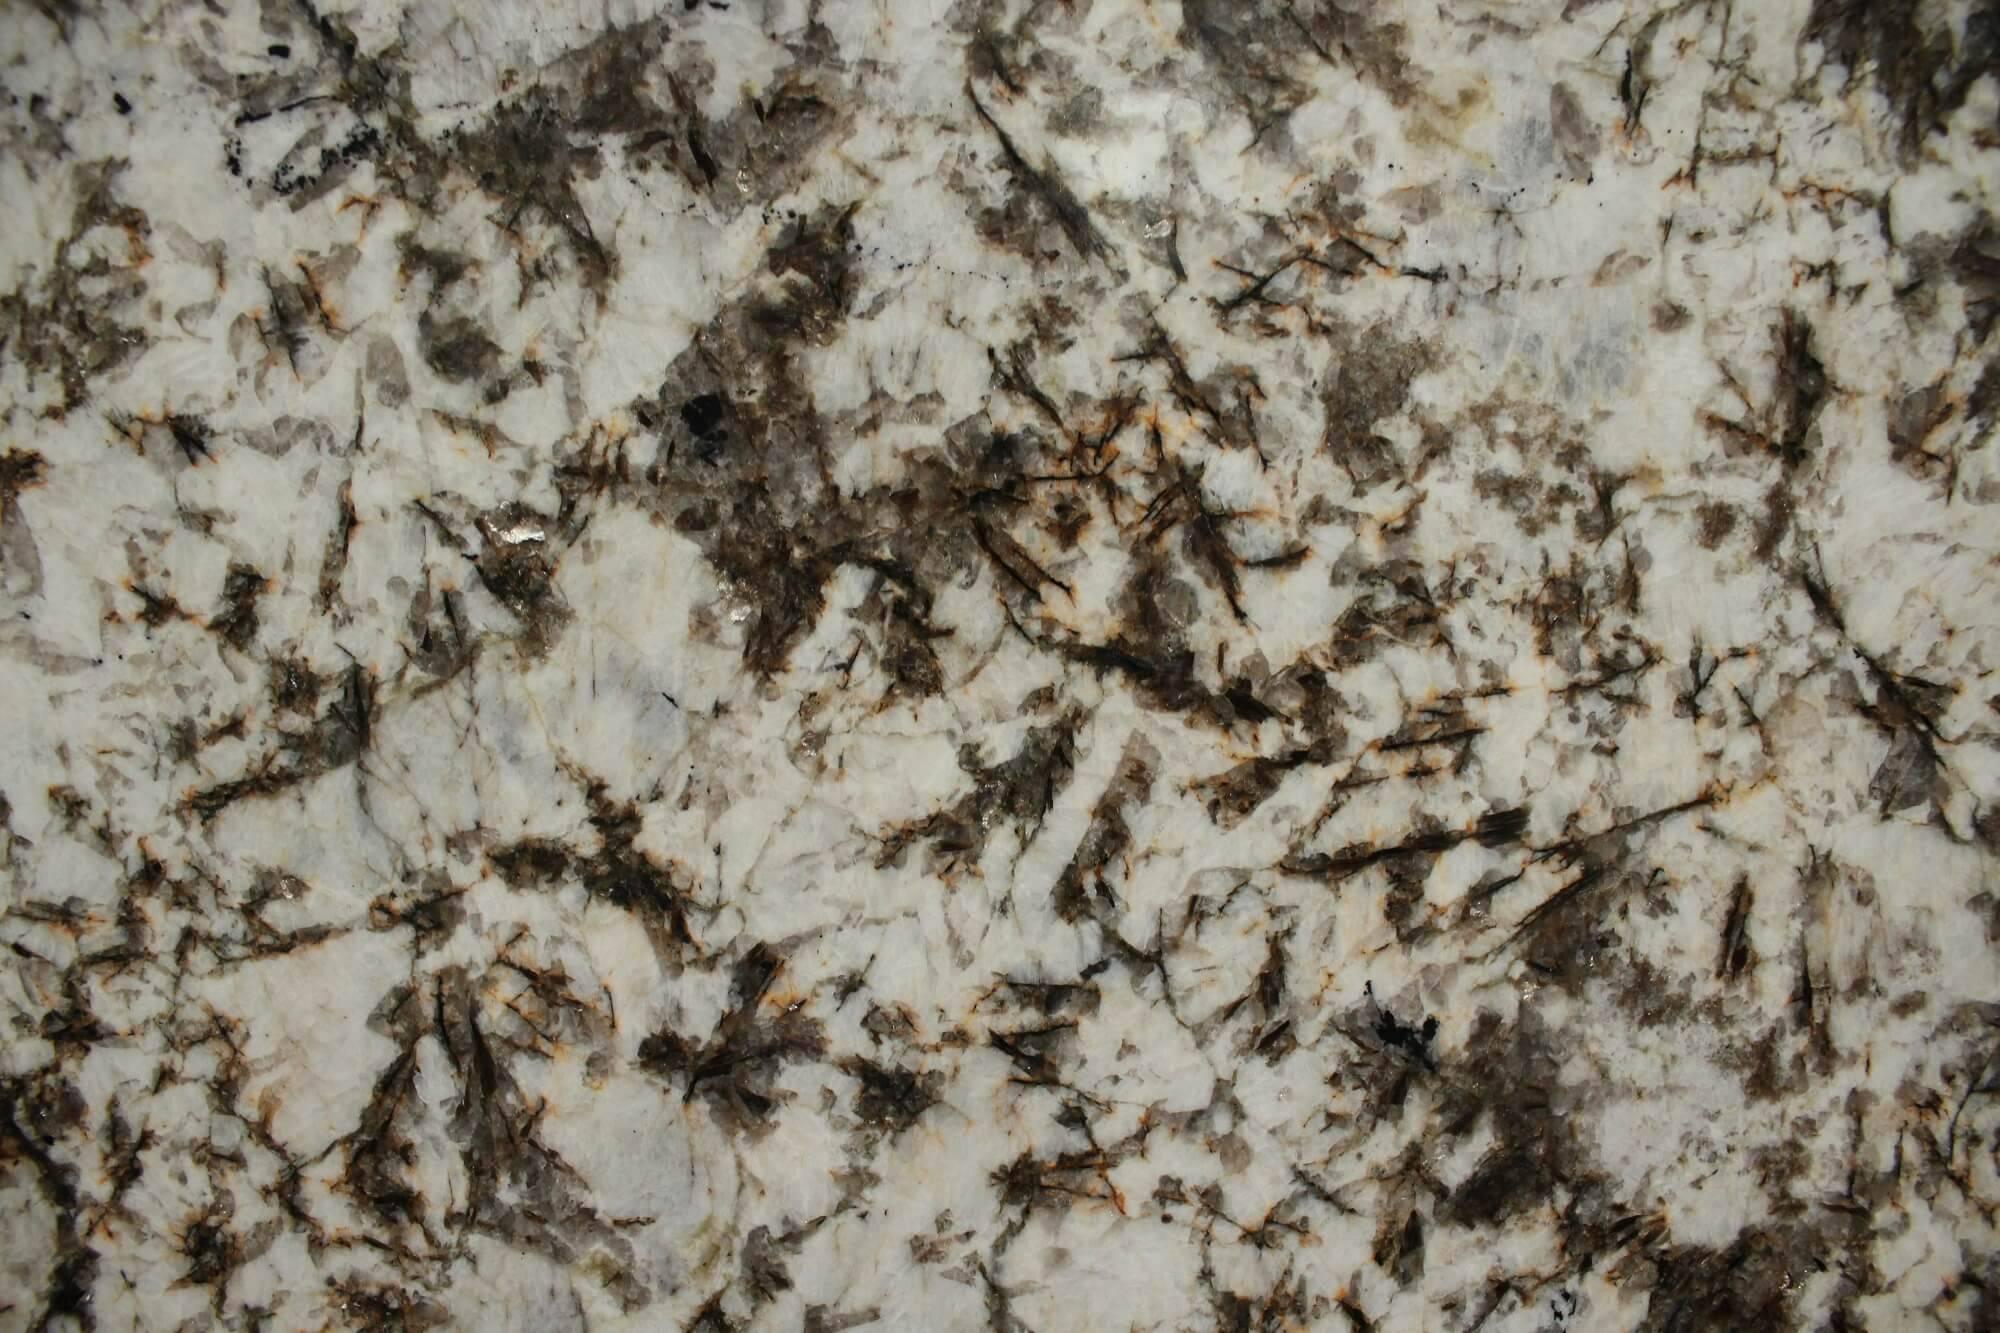 Alaska White фото 1 — камень от Bevers Marmyr